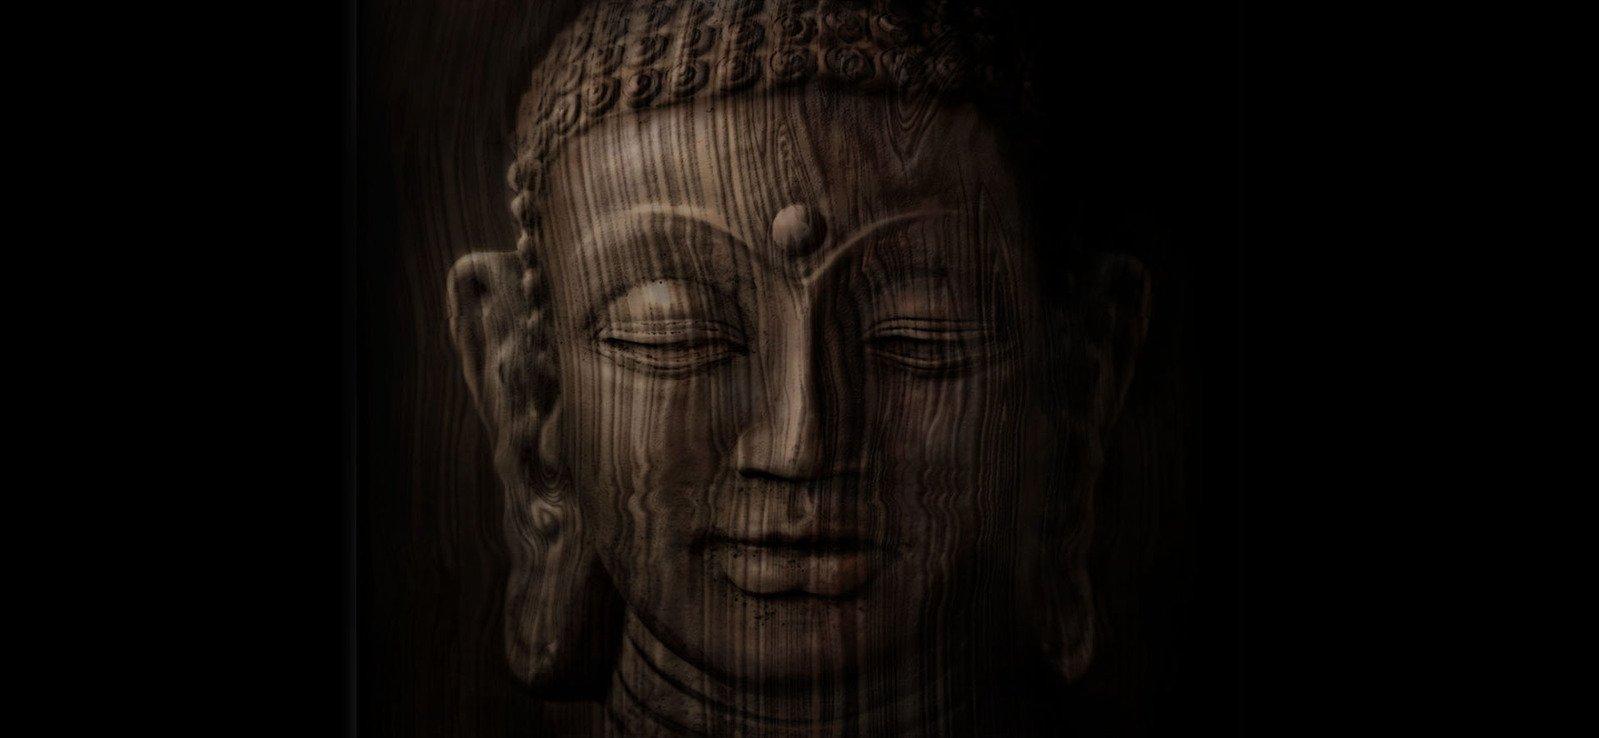 Gautam Buddha Hd Wallpaper Download Free Buddha Face Stock Photo Freeimages Com